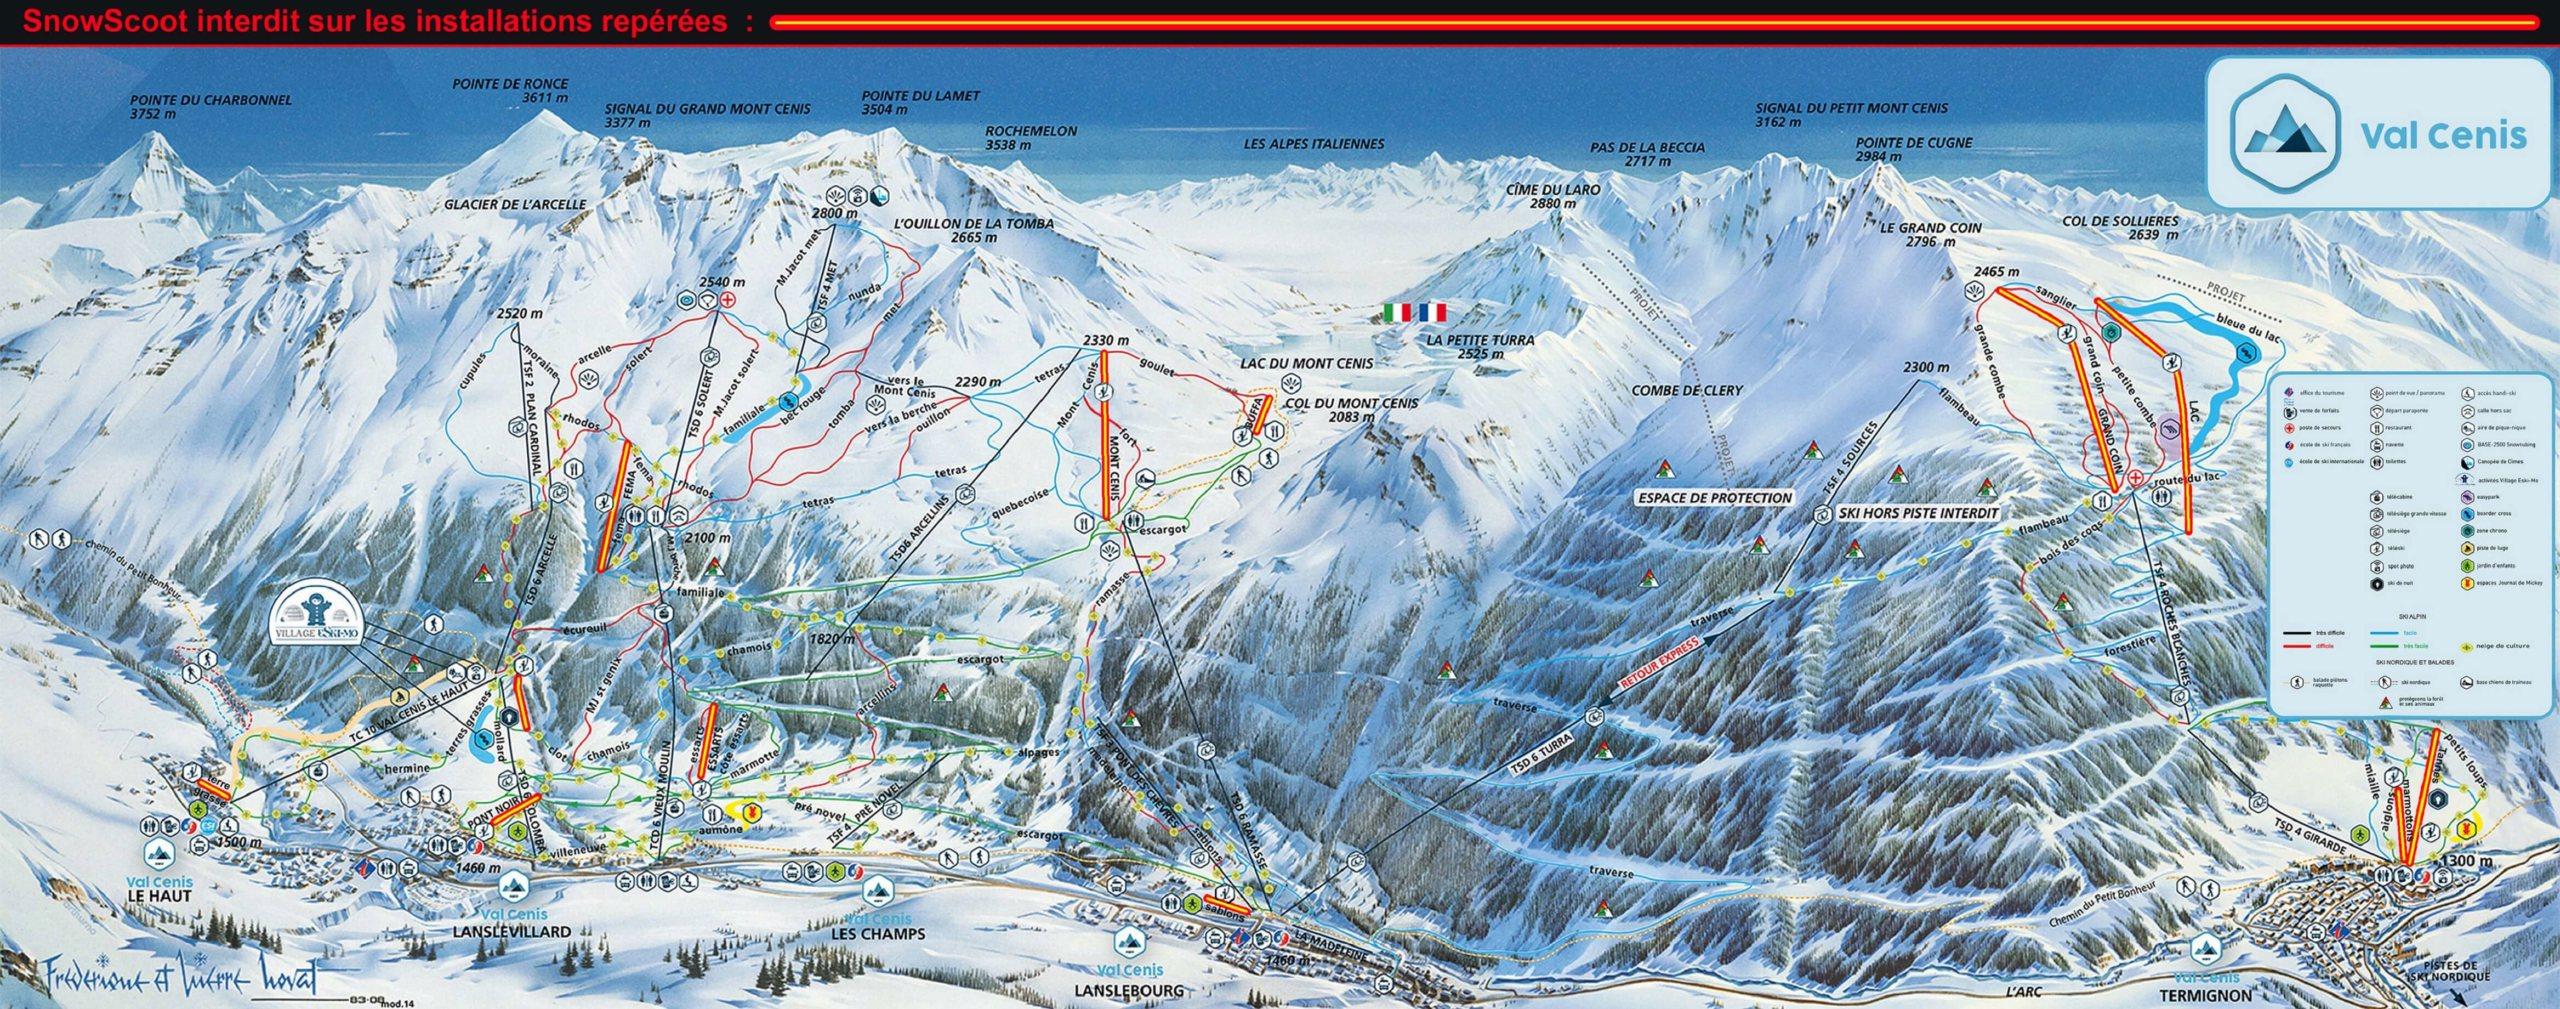 73 - Val Cenis. Snows_18